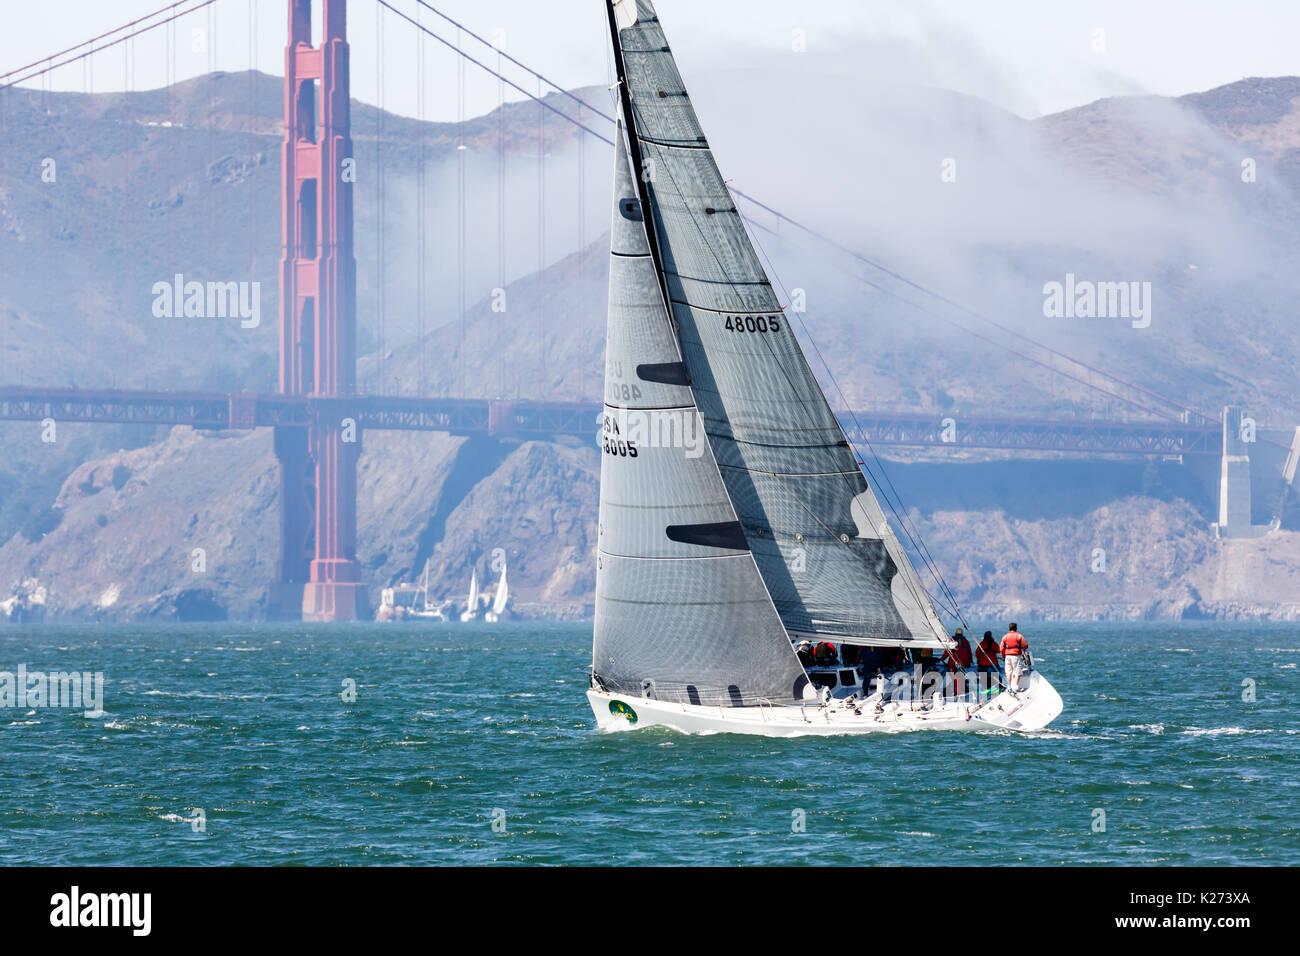 Sailing swiftly toward the Ocean under the Golden Gate Bridge - Stock Image